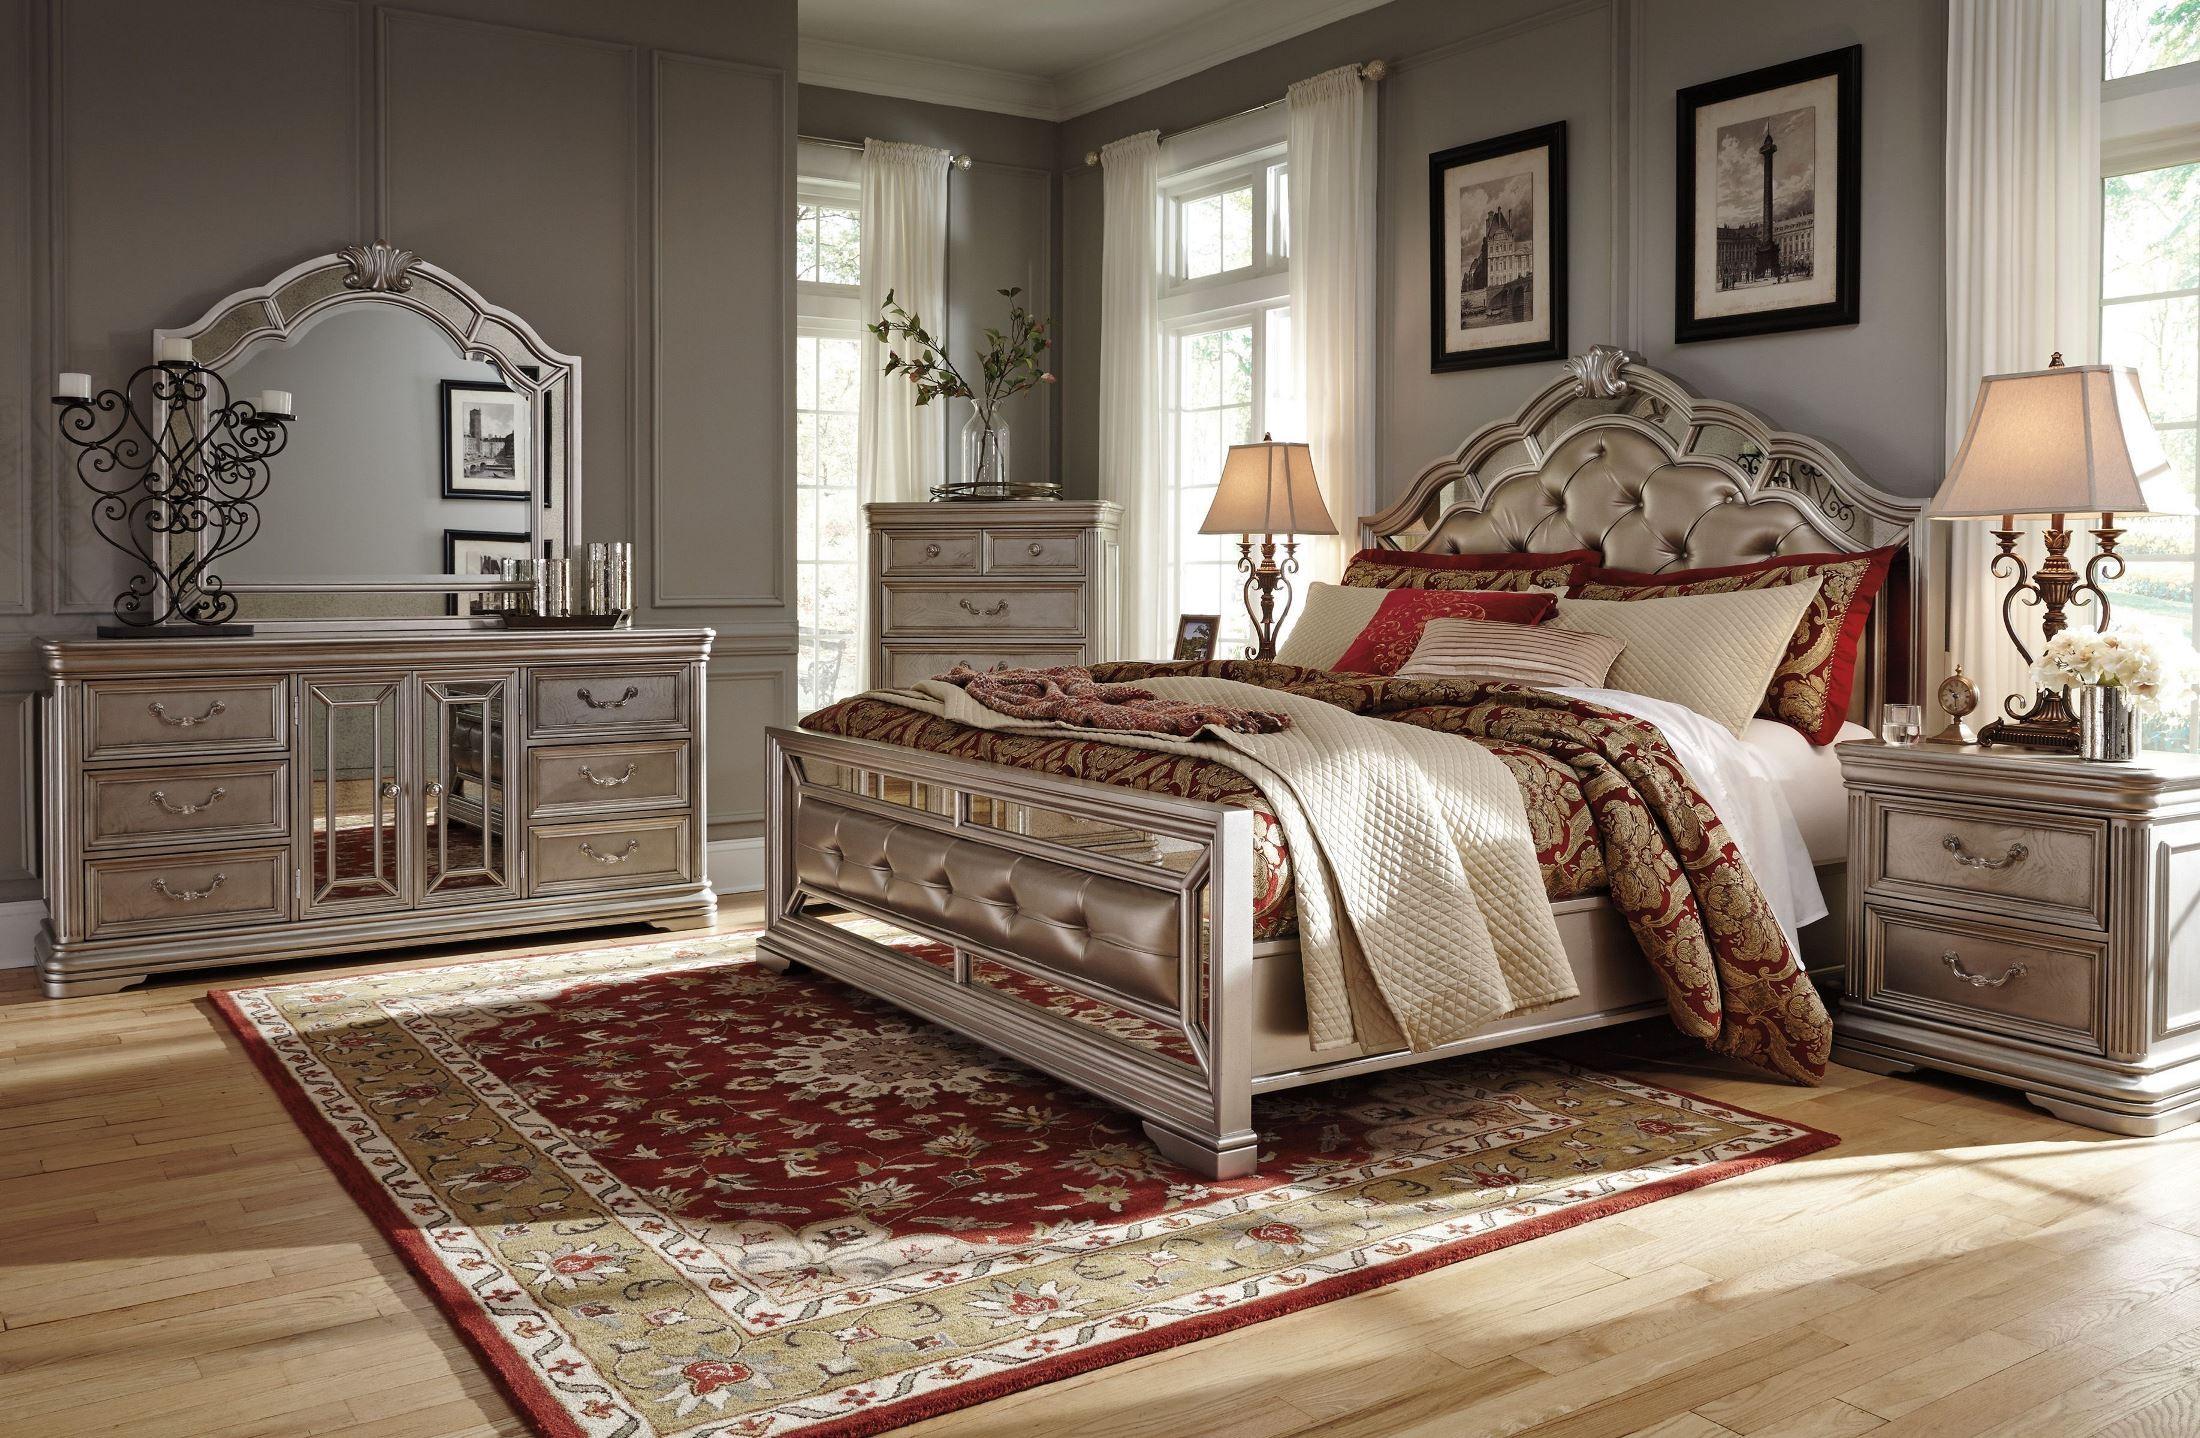 Birlanny Silver Upholstered Panel Bedroom Set Media Gallery 1